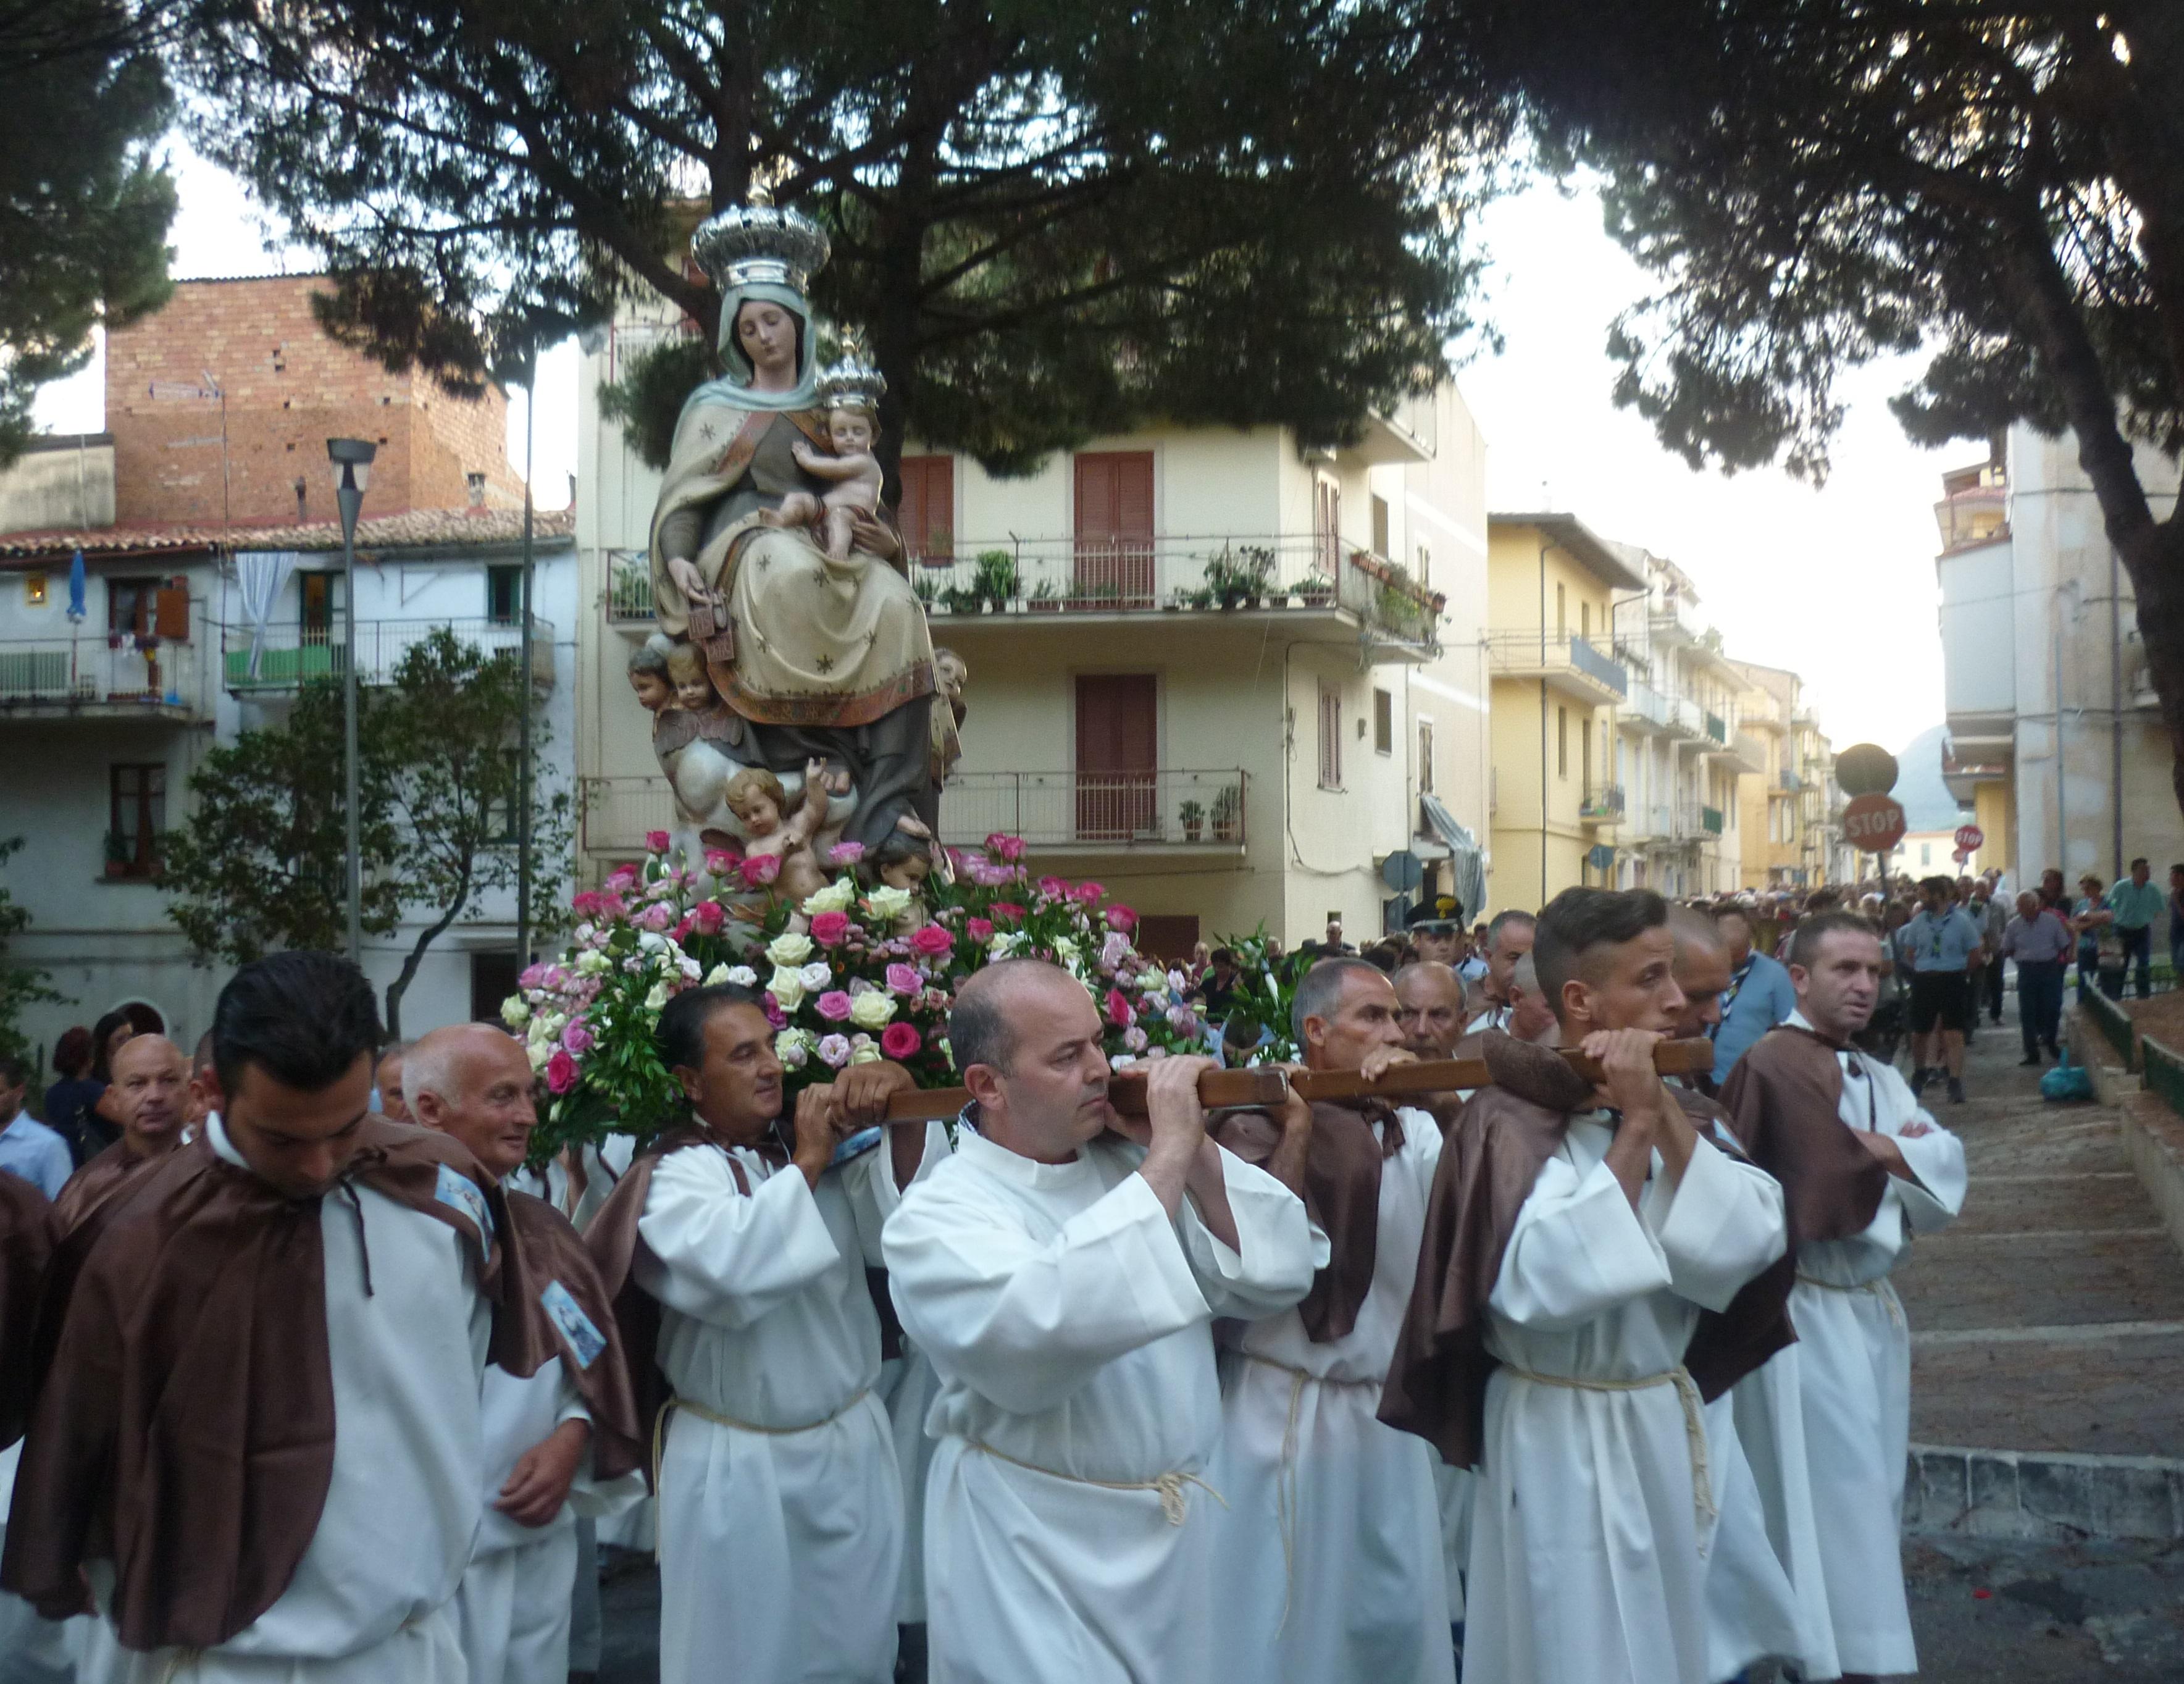 Festa del Carmine - LameziaTerme.it